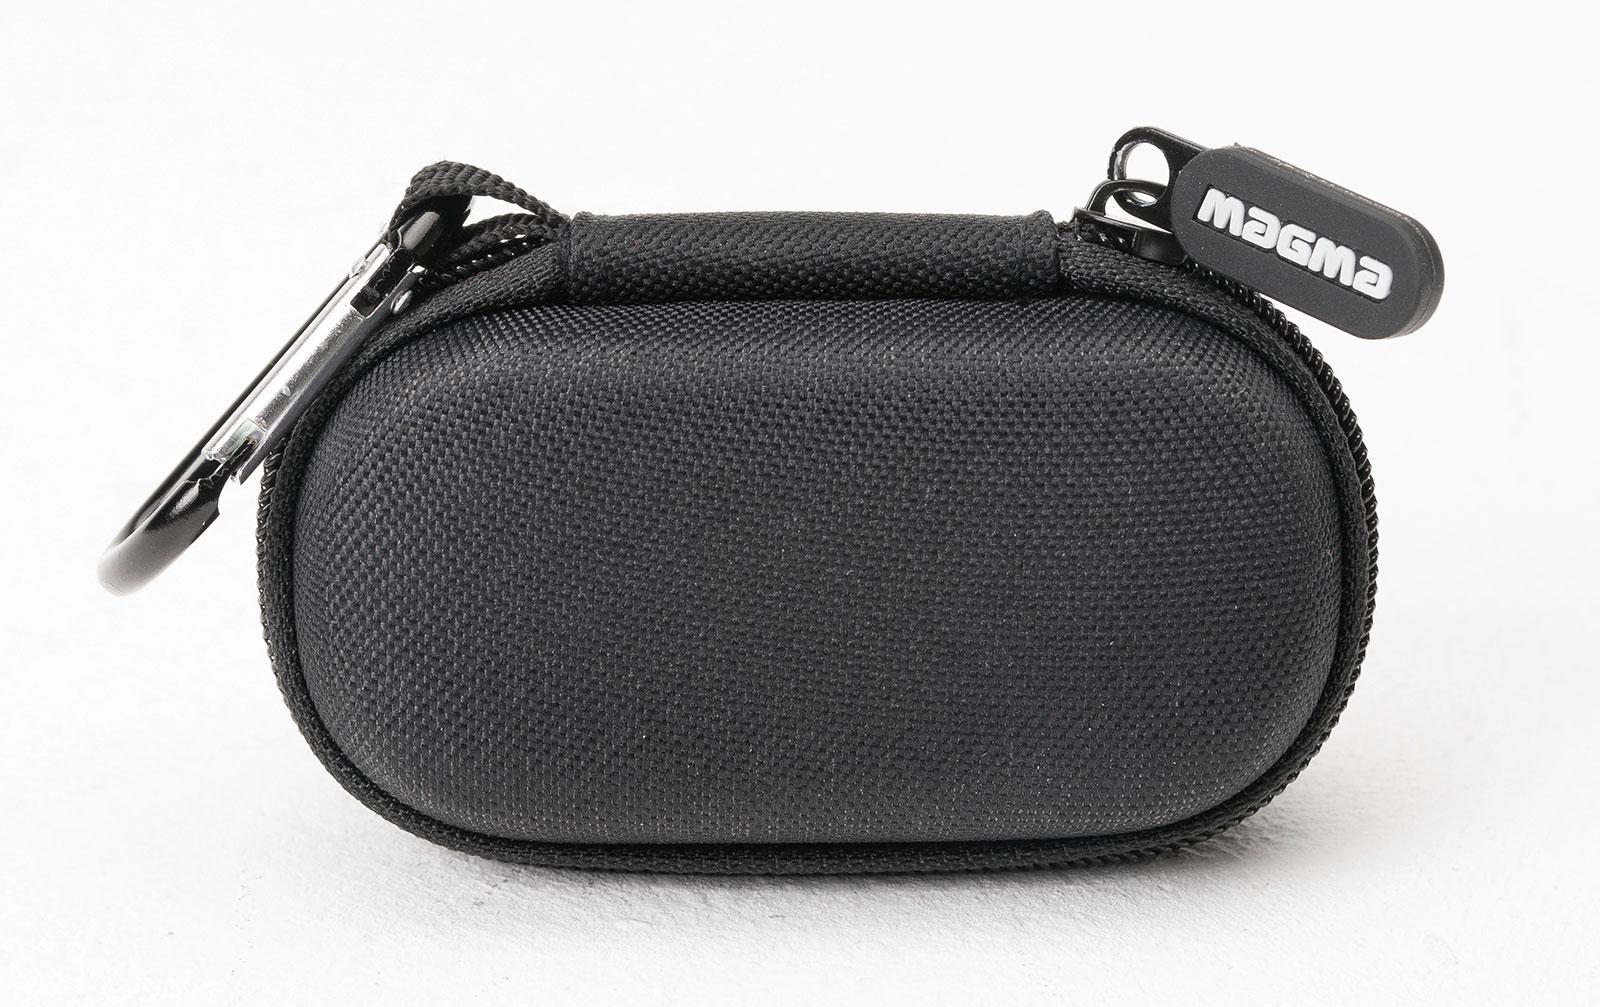 magma-45-adapter-case-black-black-48018-